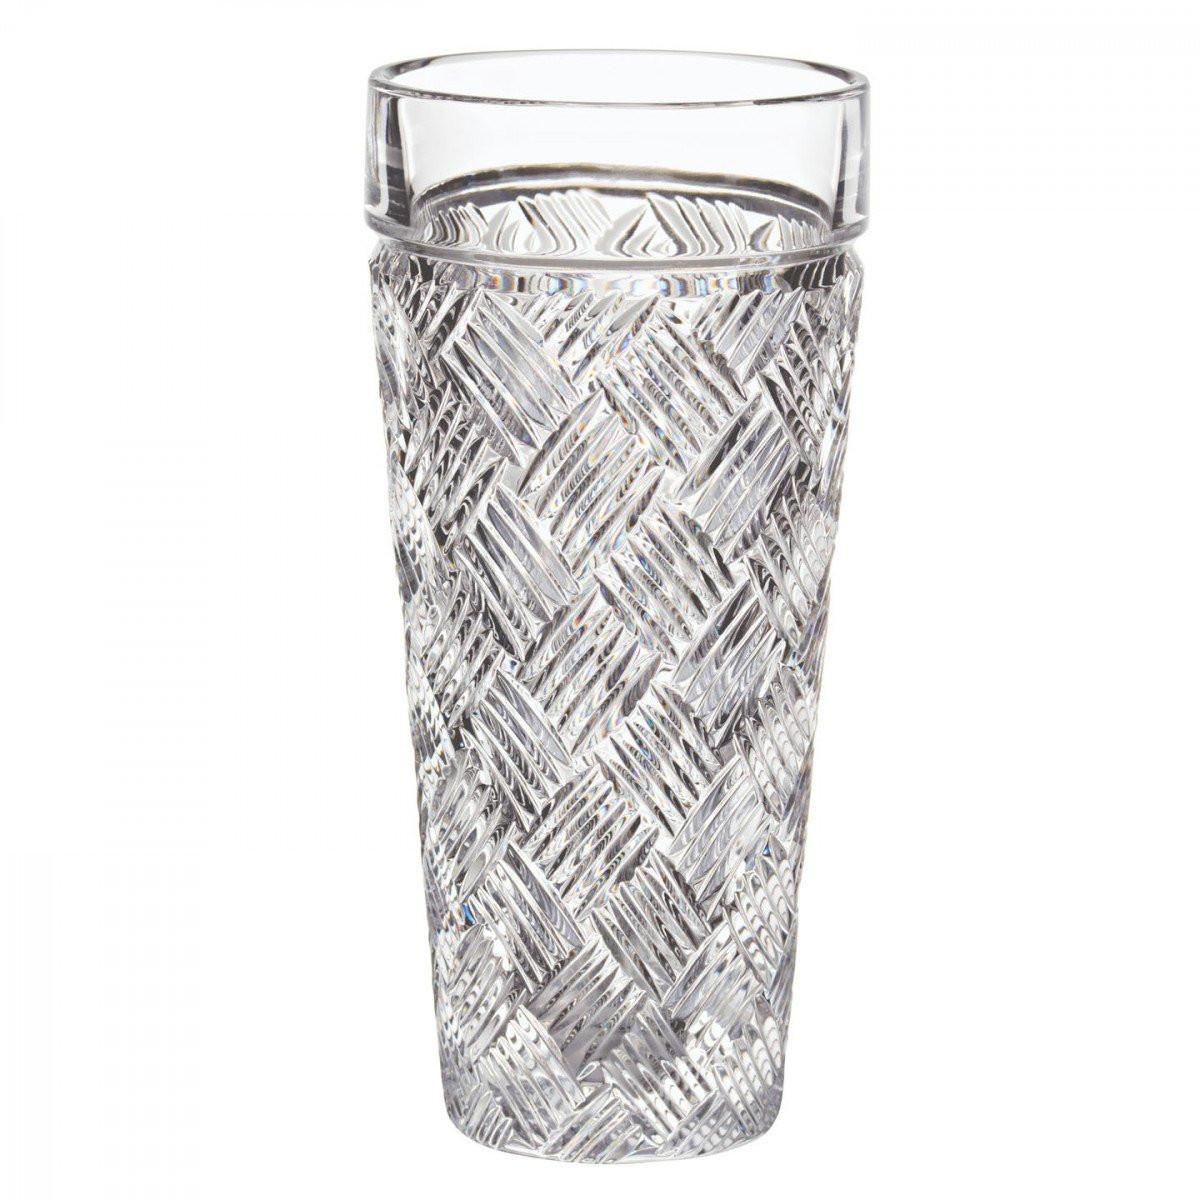 Retired Waterford Crystal Vase Patterns Of Versa 11in Vase Discontinued Marquis by Waterford Us Inside Versa 11in Vase Discontinued